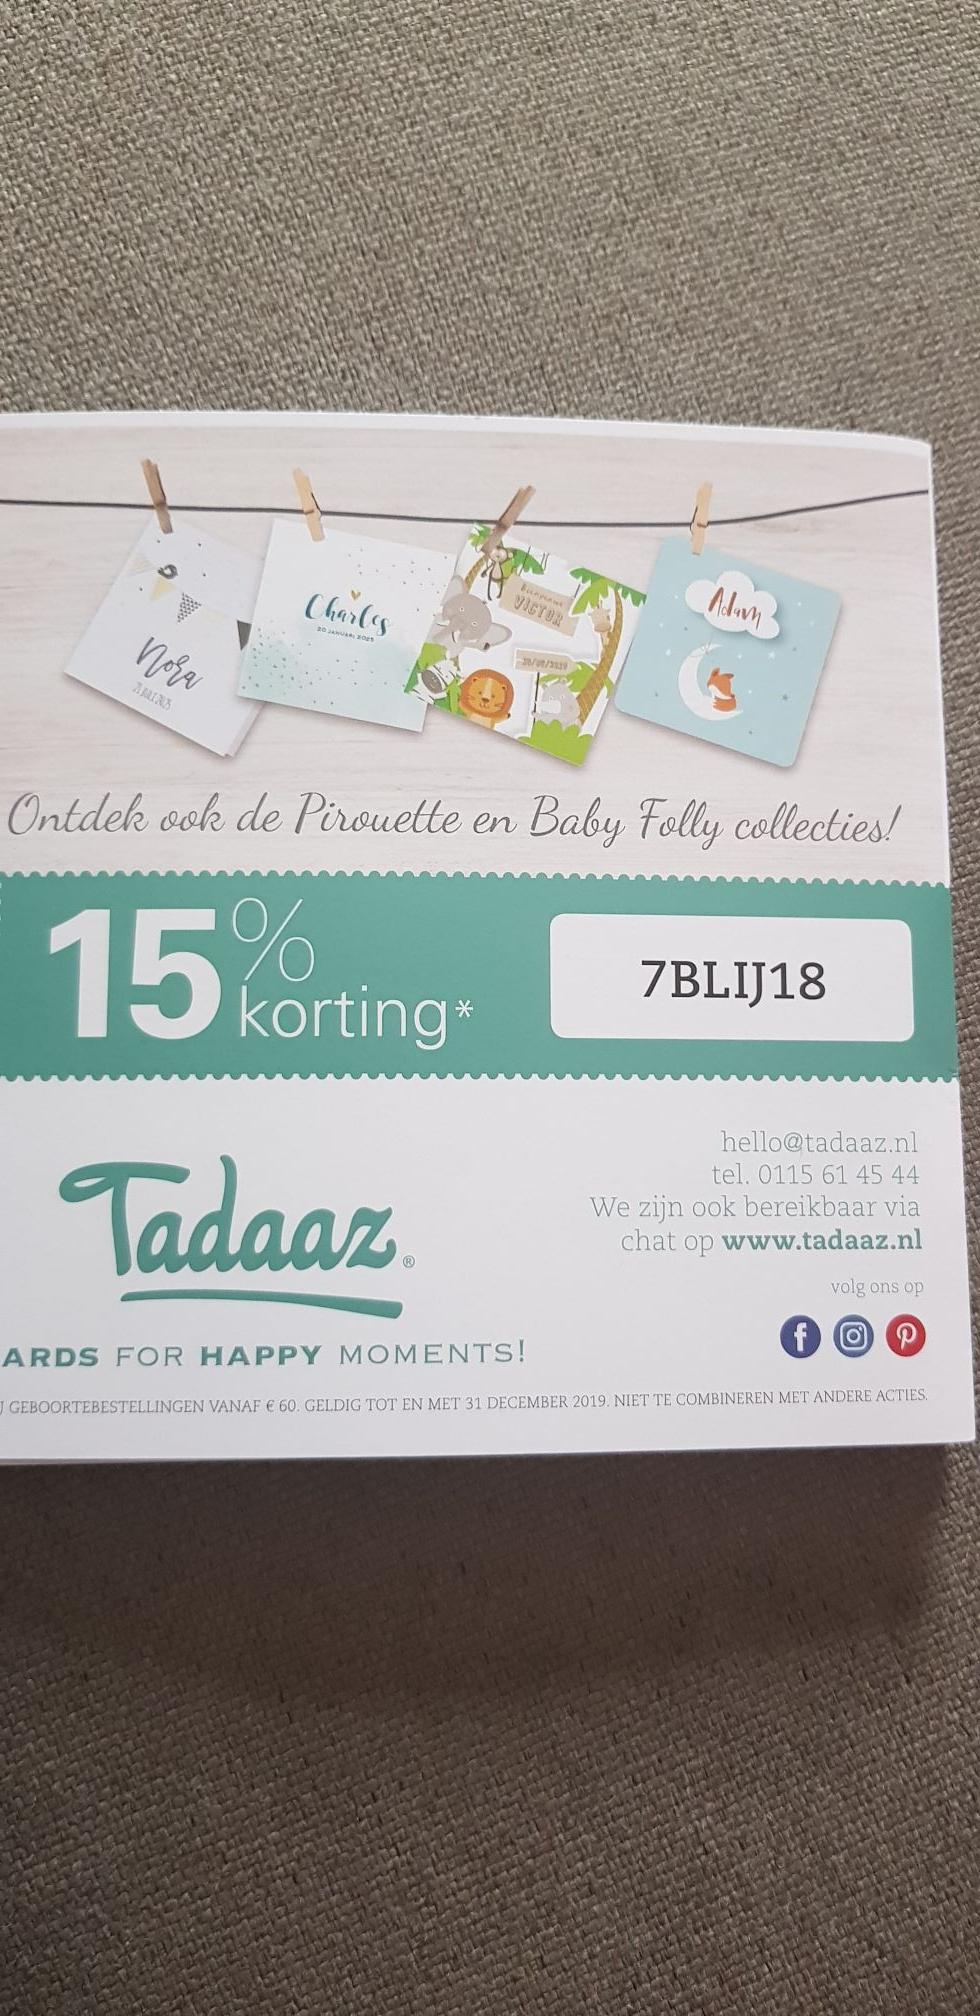 15% korting bij Tadaaz